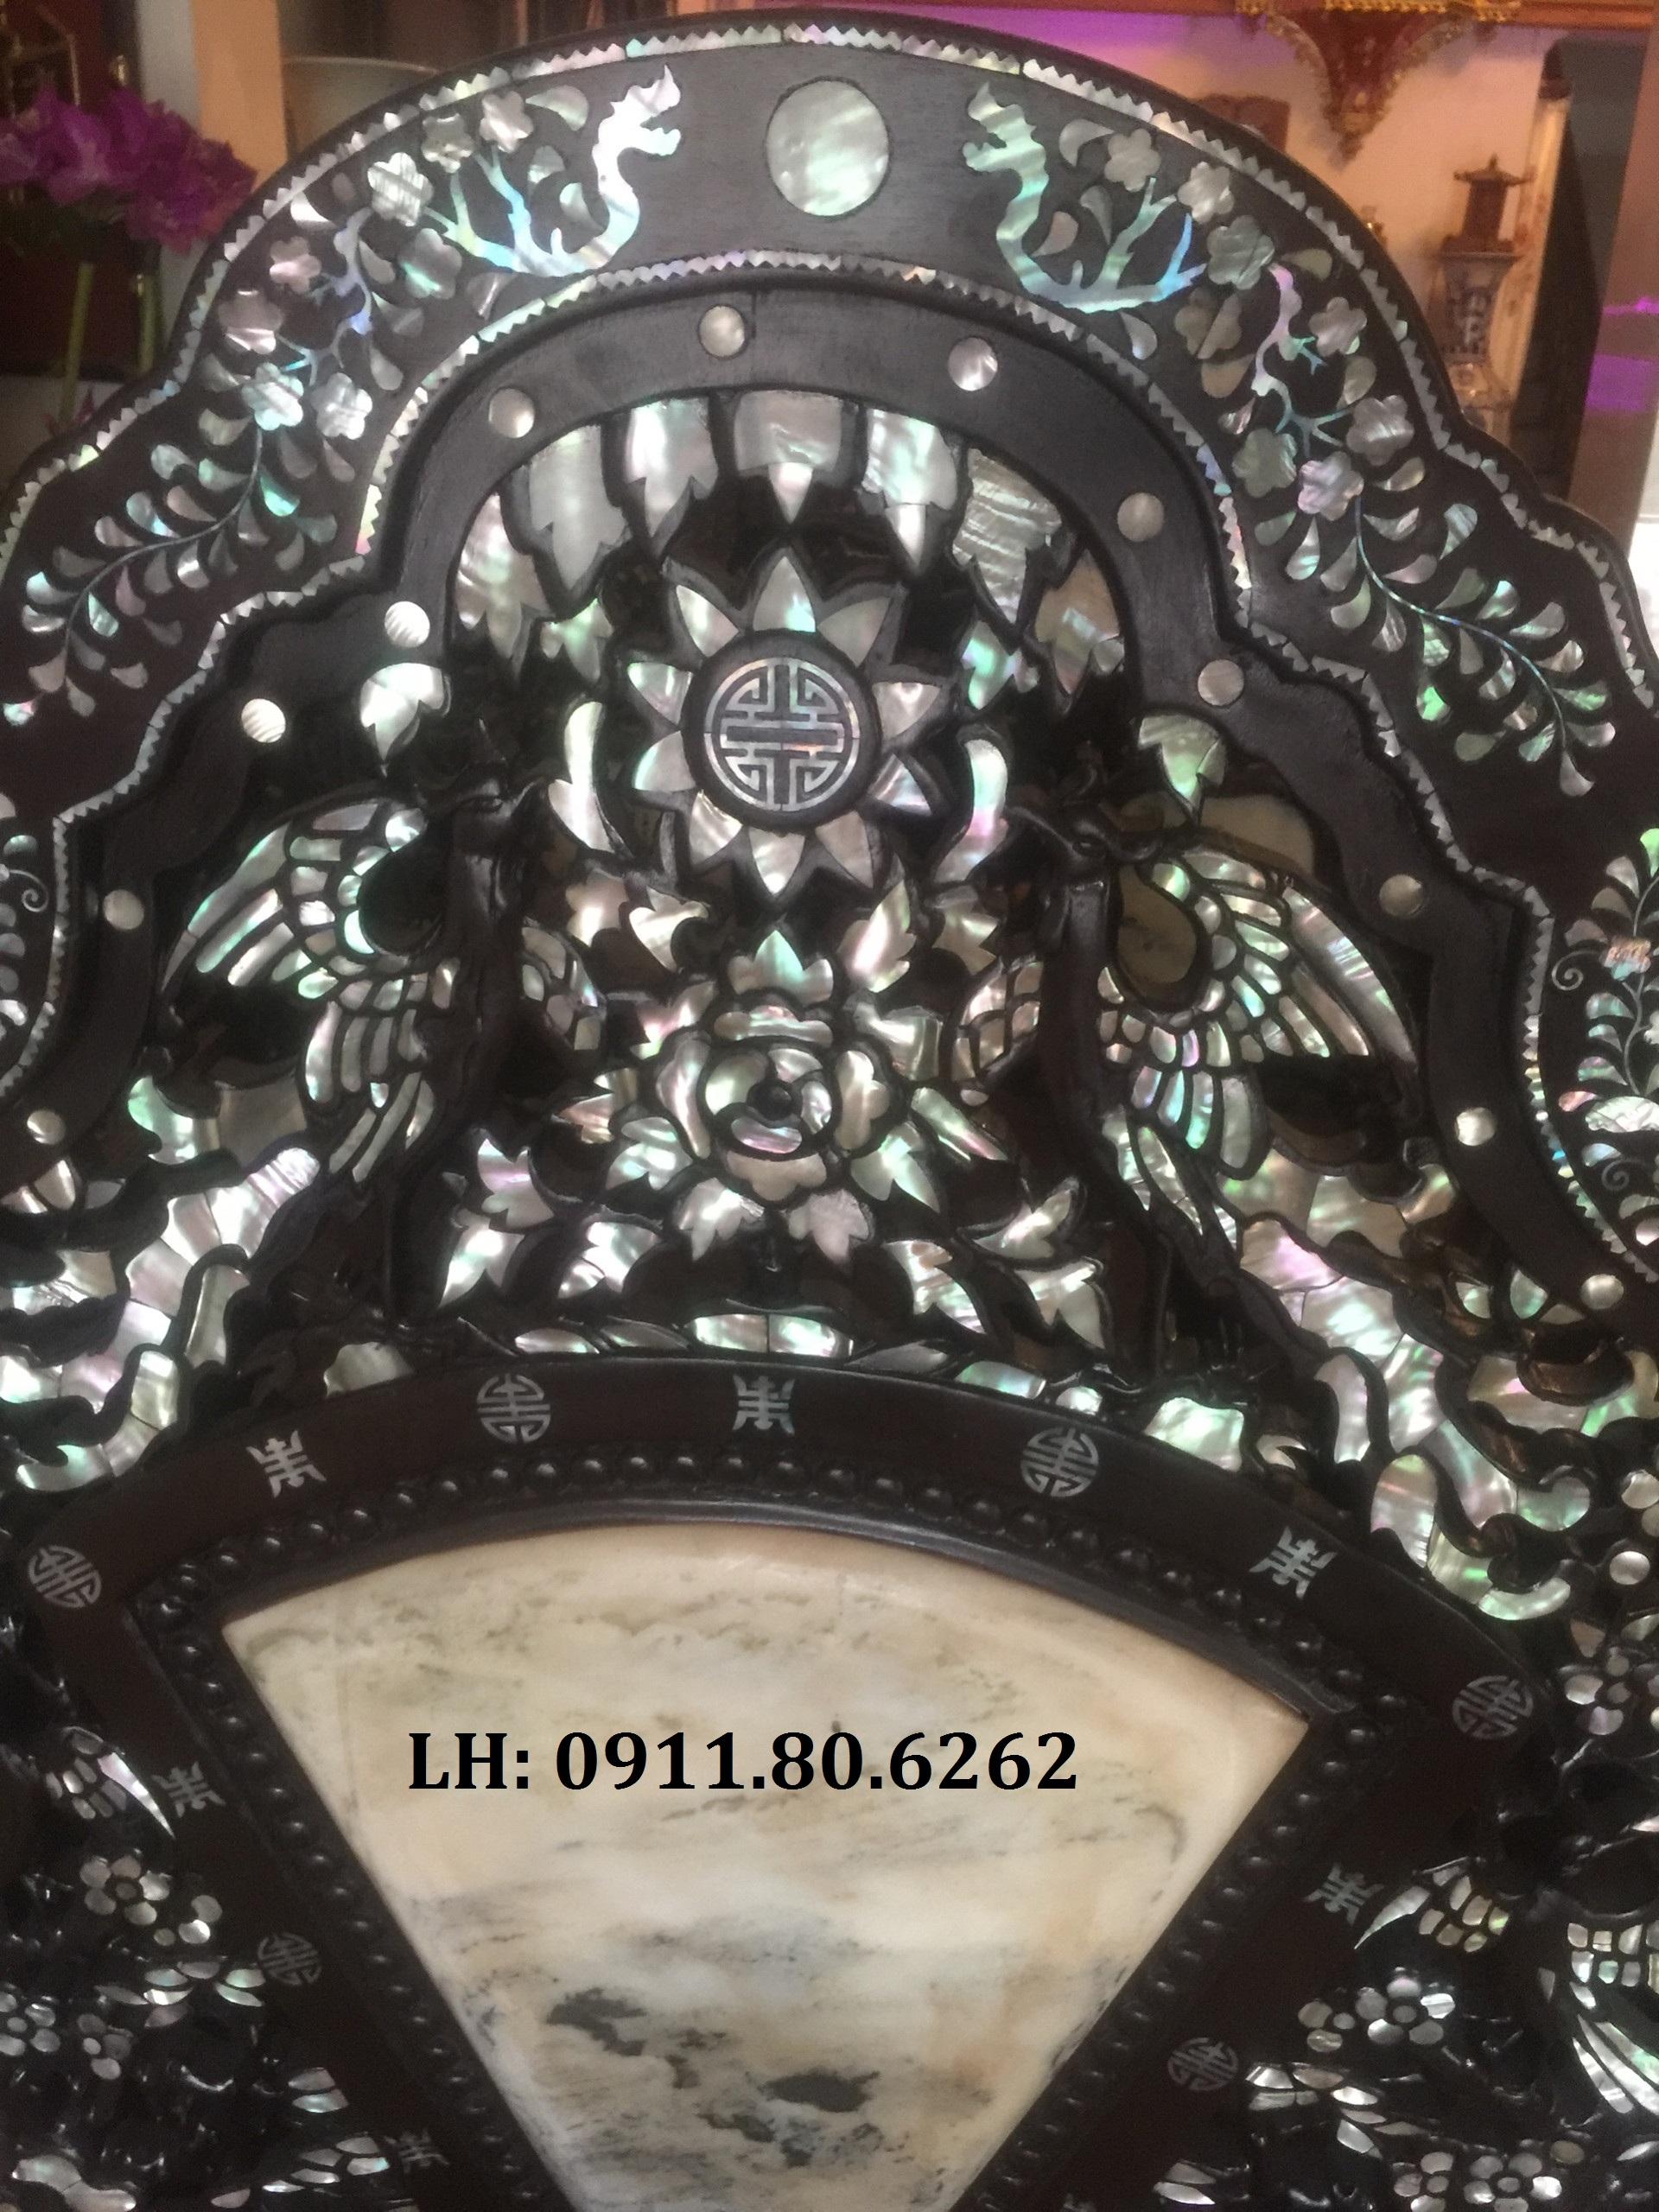 z973844704003 f3fc7f33fec5c98079ff10d74c1d21aa - Giường Ba Thành Khảm ốc MS: 02